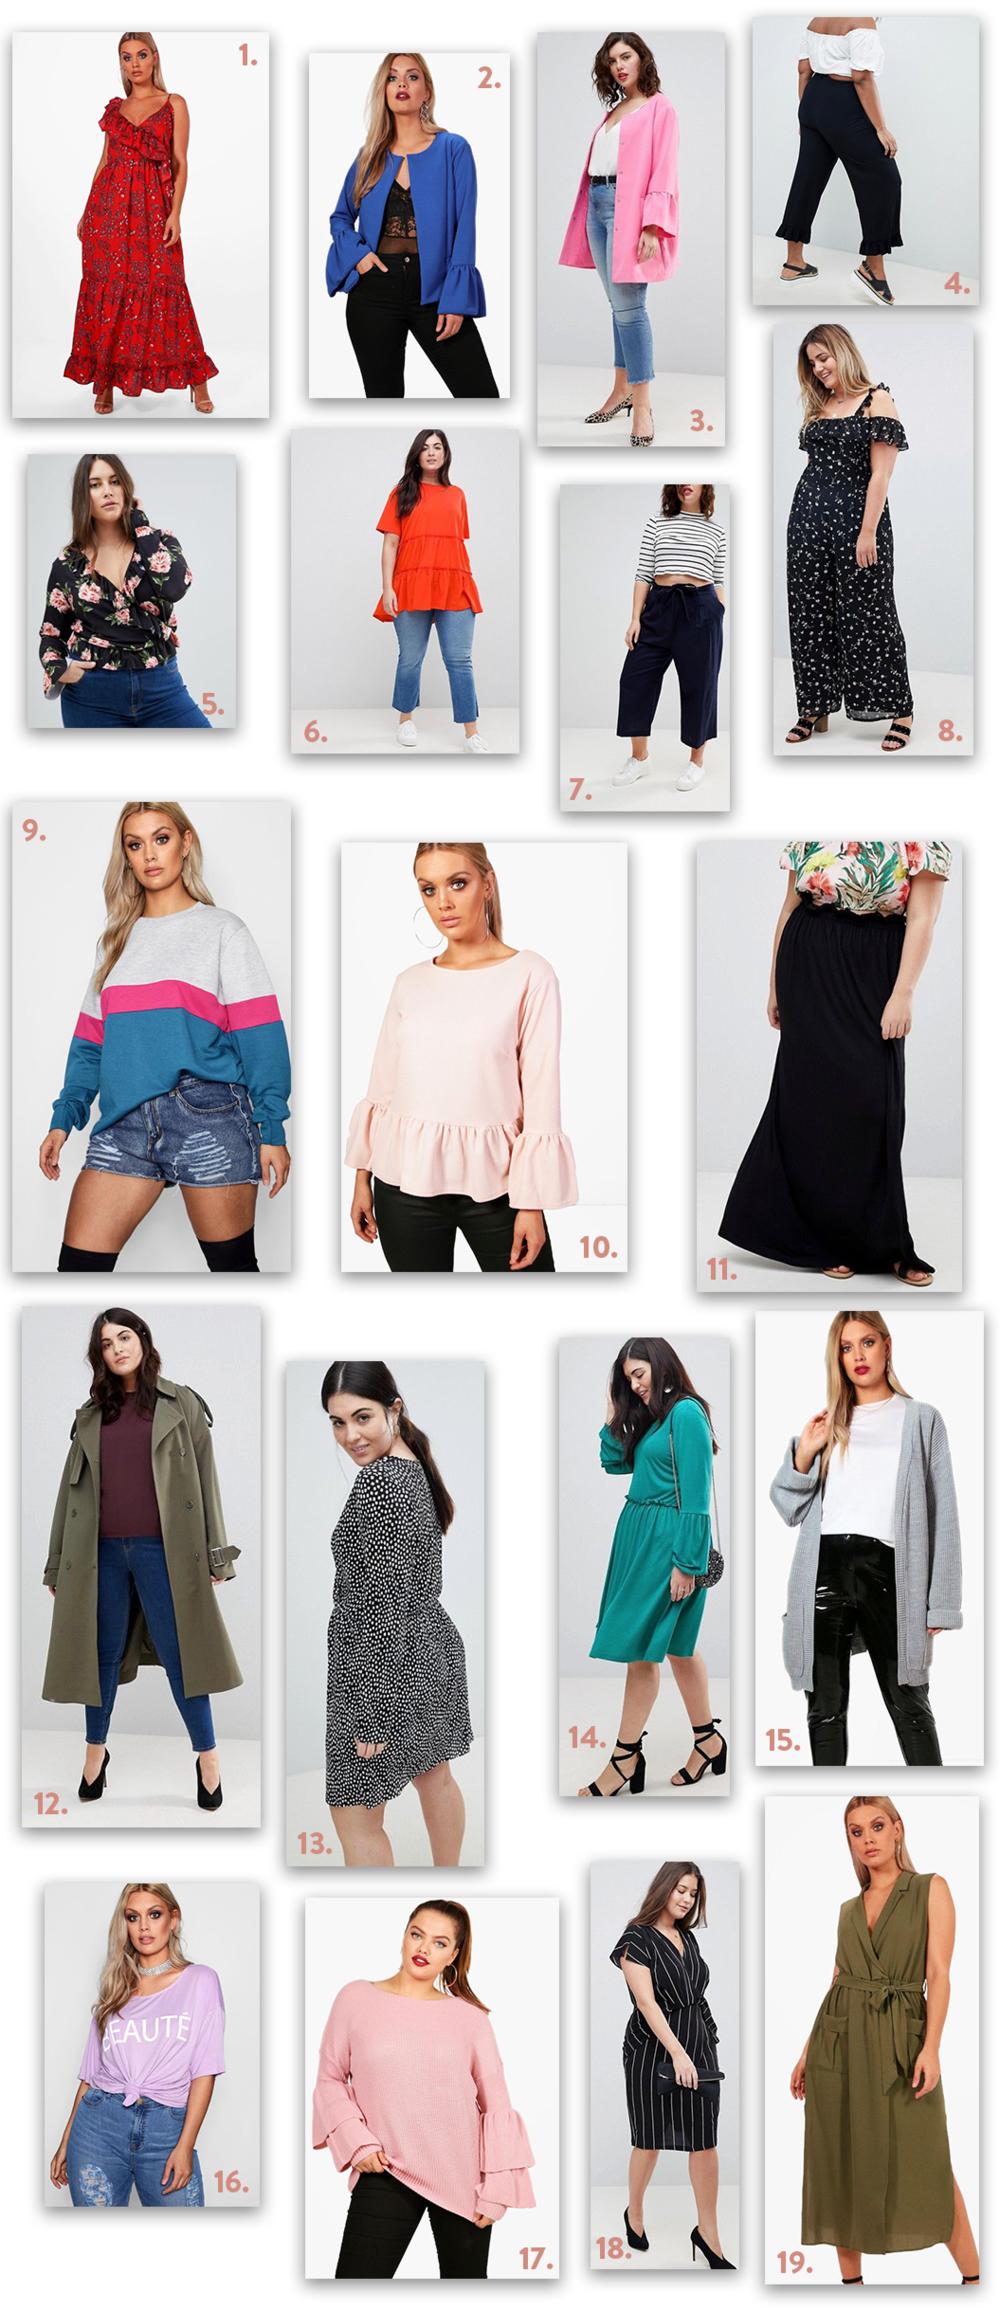 Plus Size Fashion Wishlist | EmmaLouisa.com